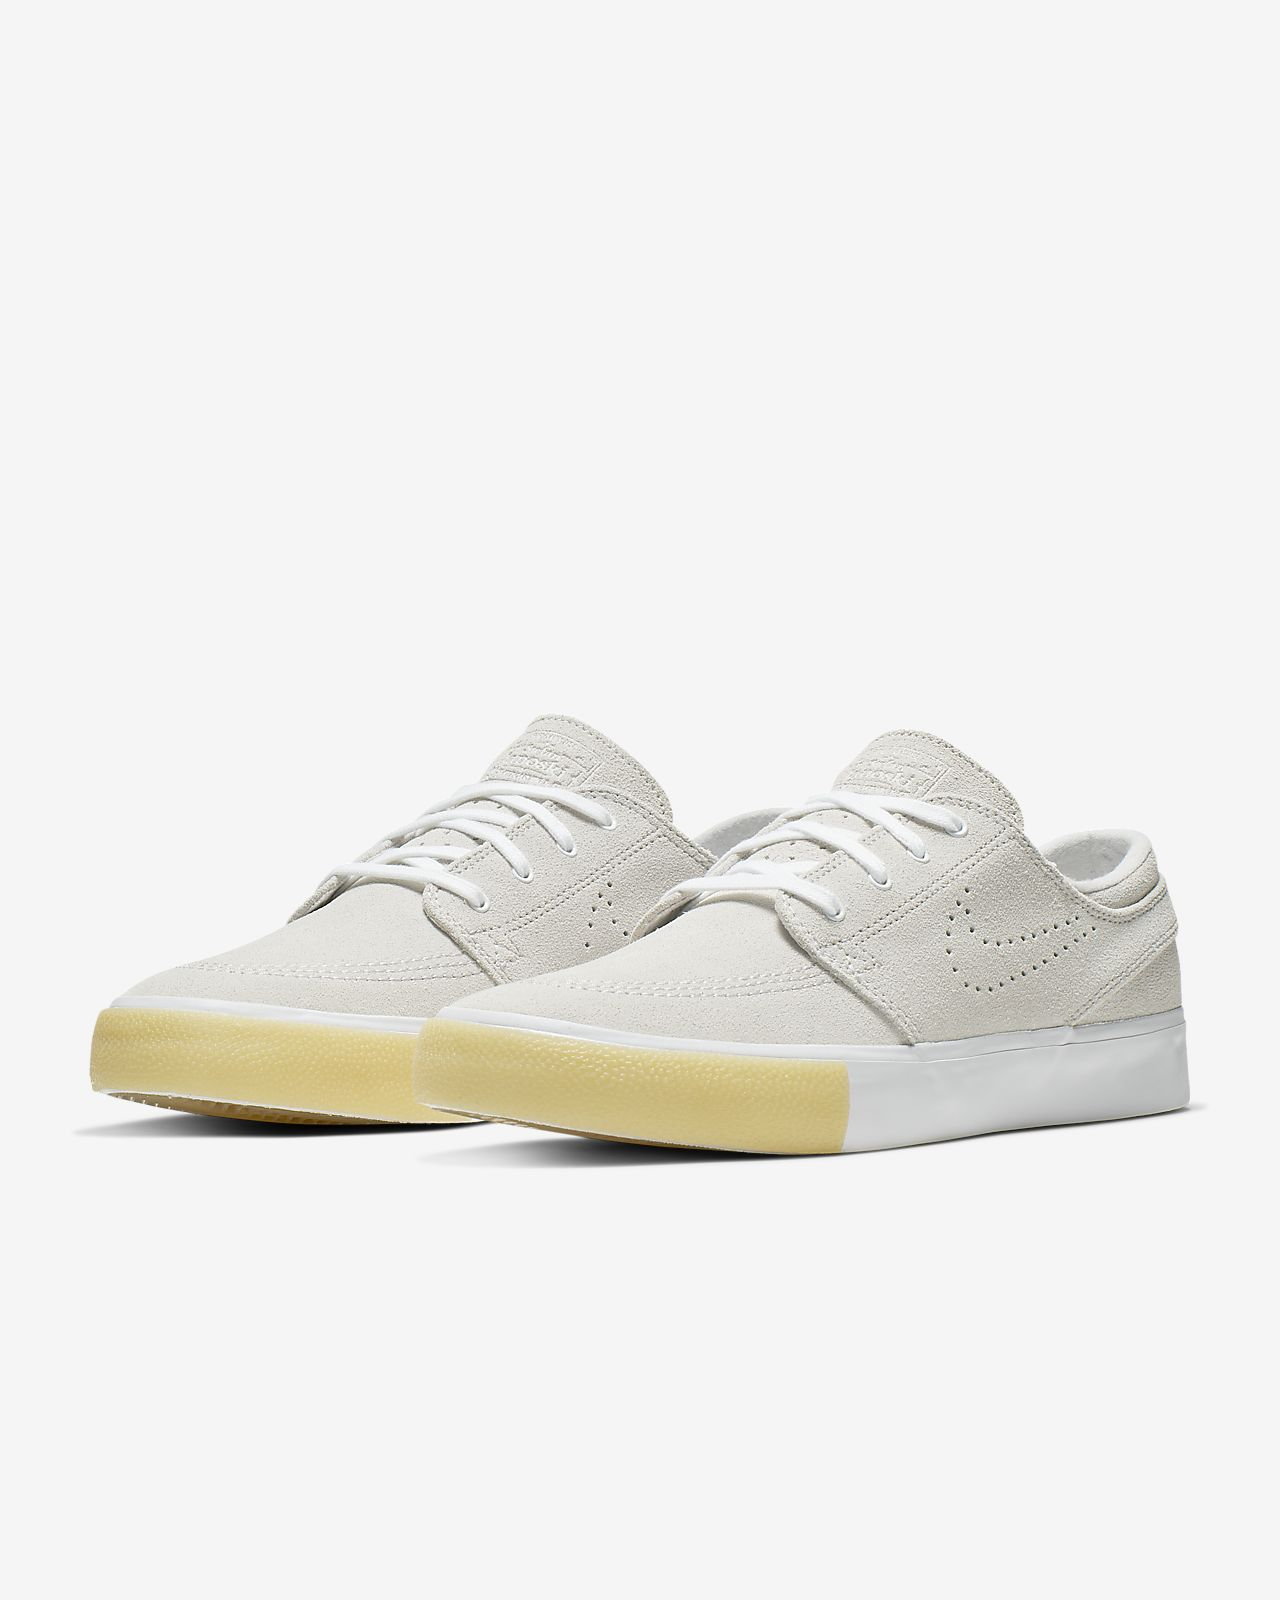 Trainers   Nike SB Mens Zoom Stefan Janoski Shoes Vast Grey black